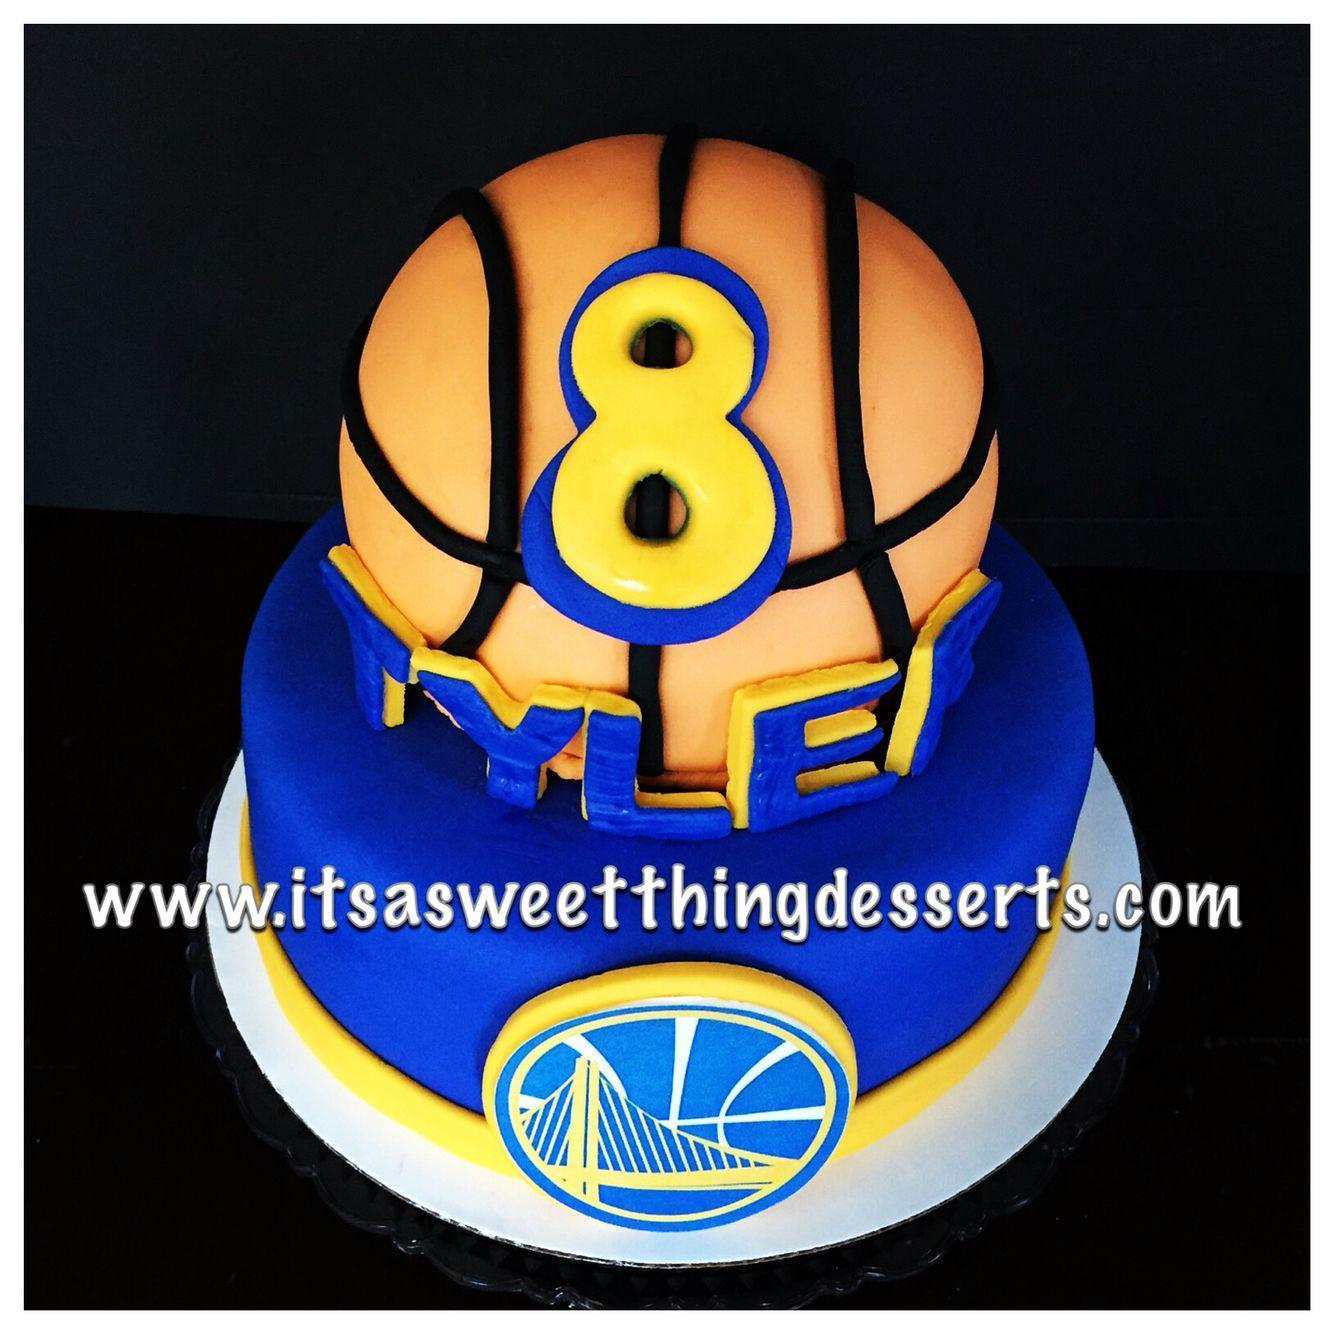 Golden State Warriors Themed Cake